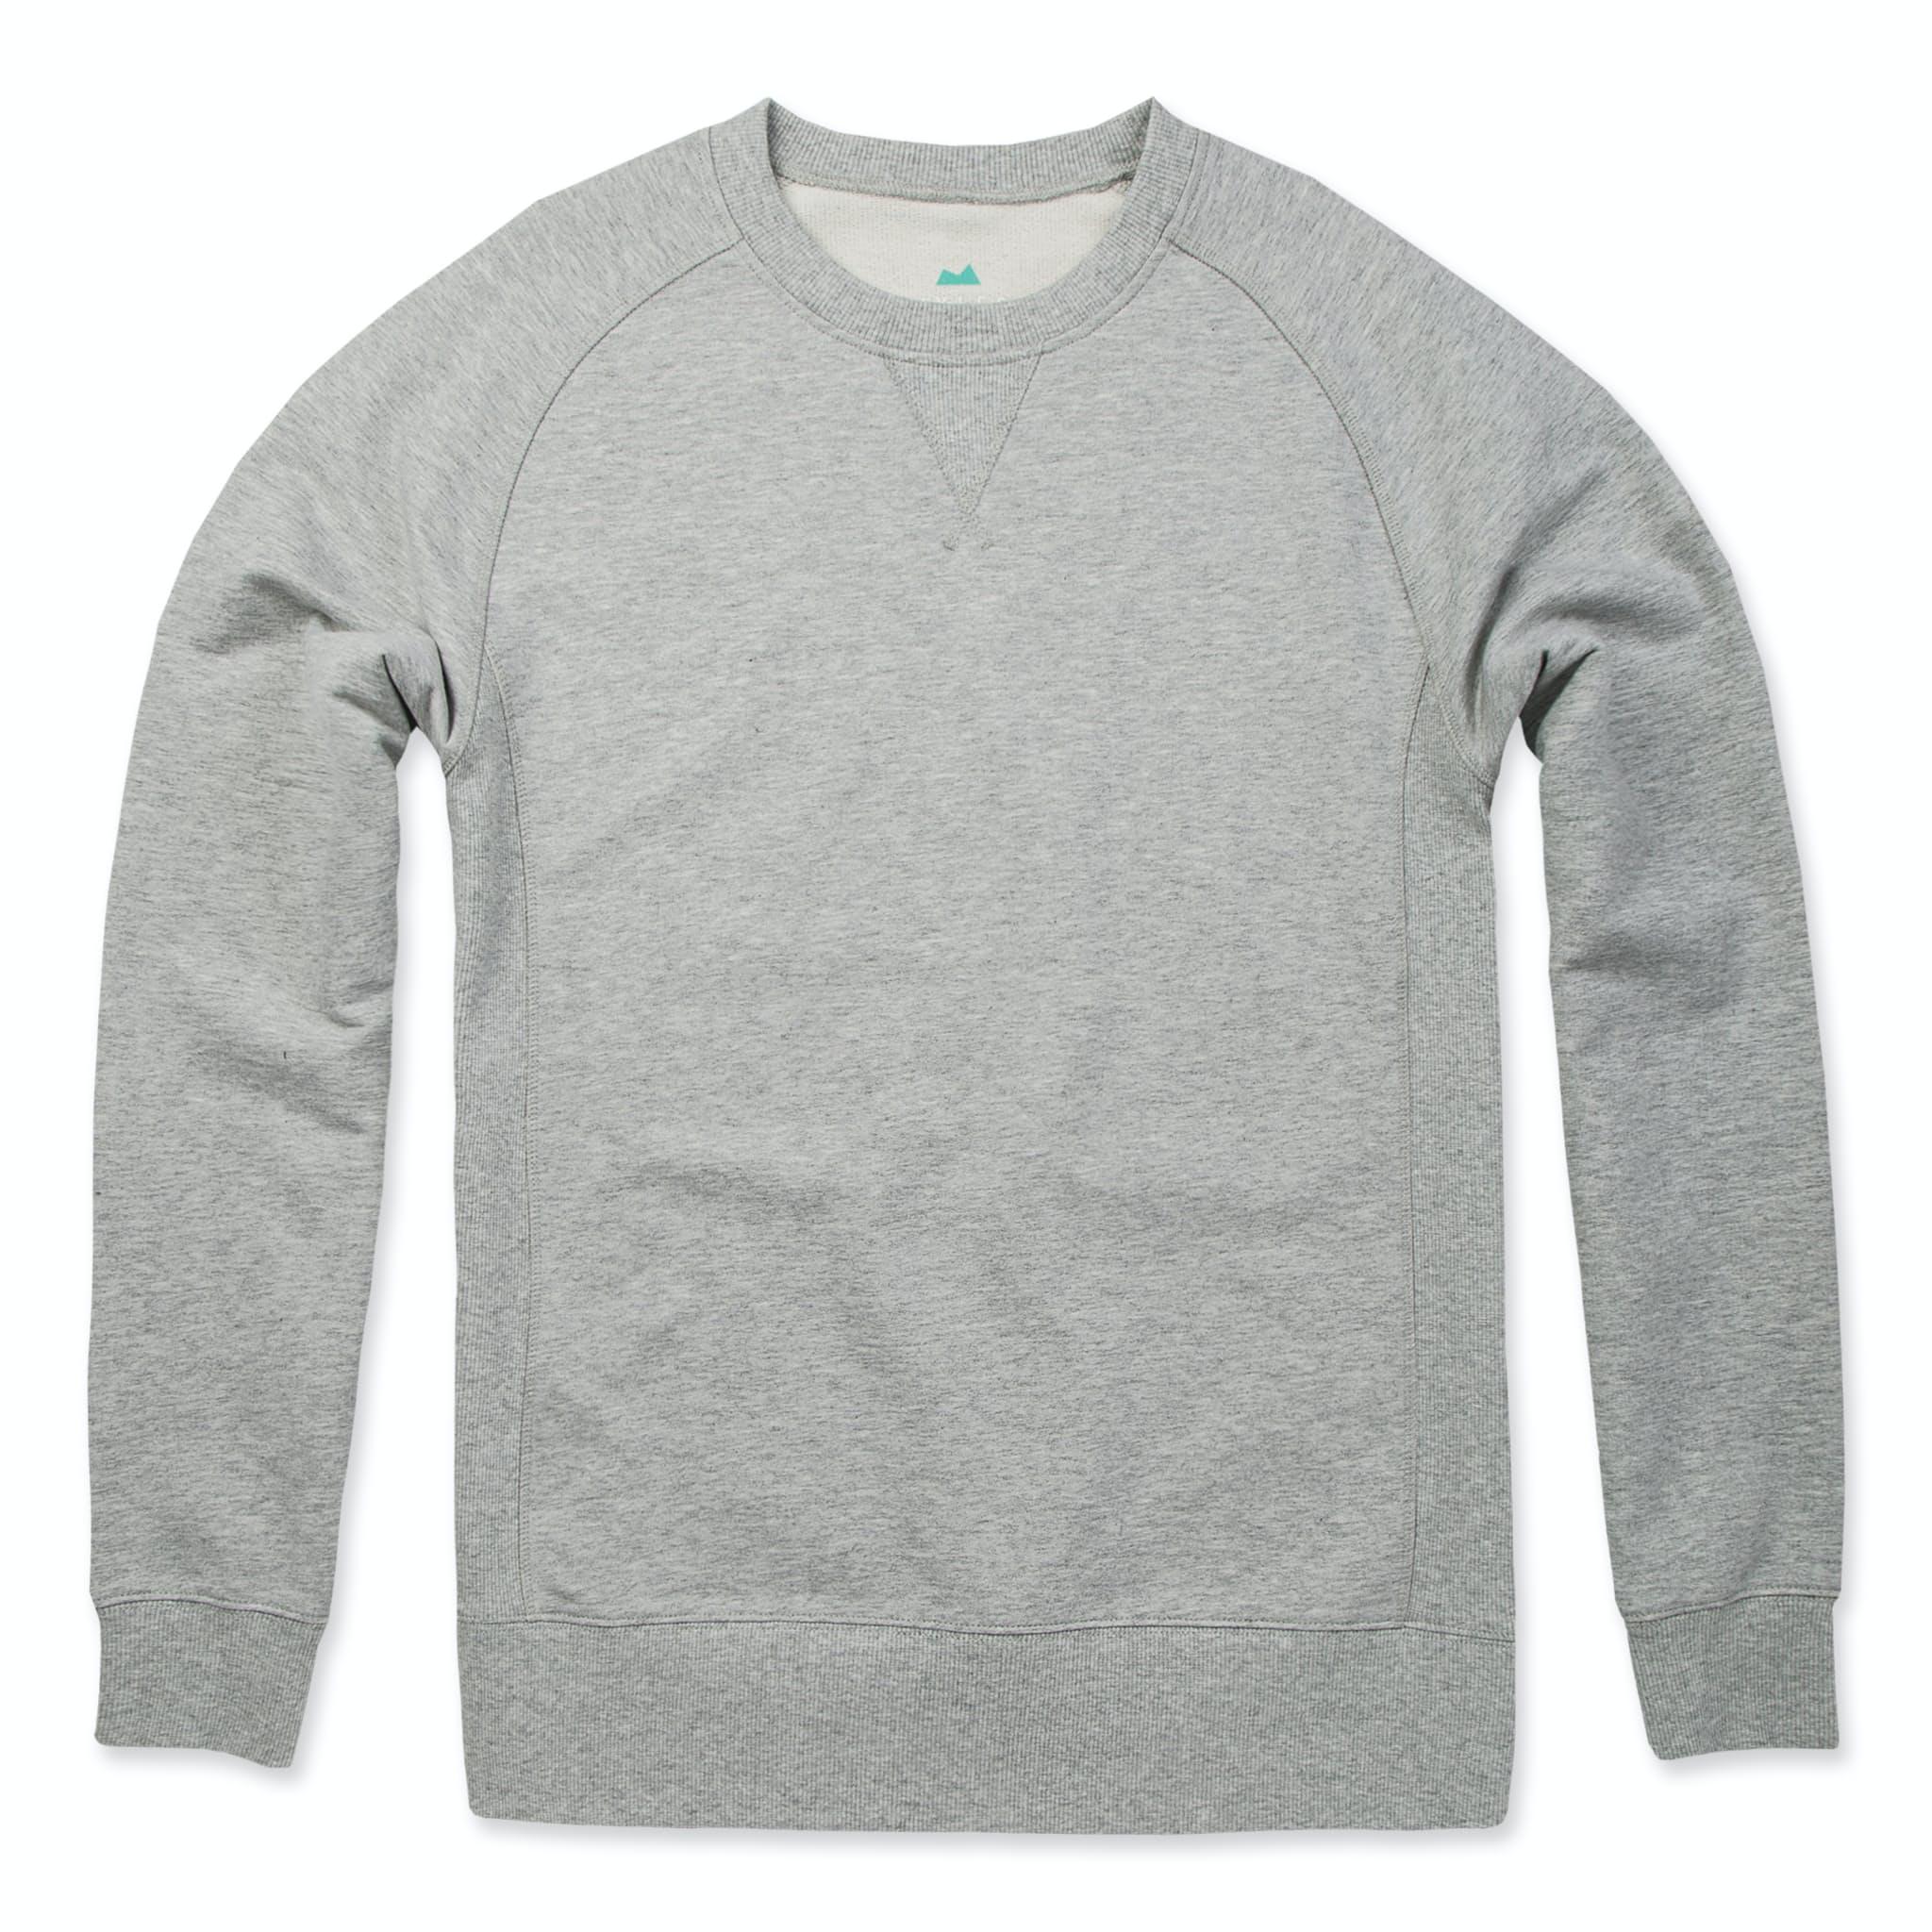 Dk3j0ytrav myles apparel elements crew 0 original